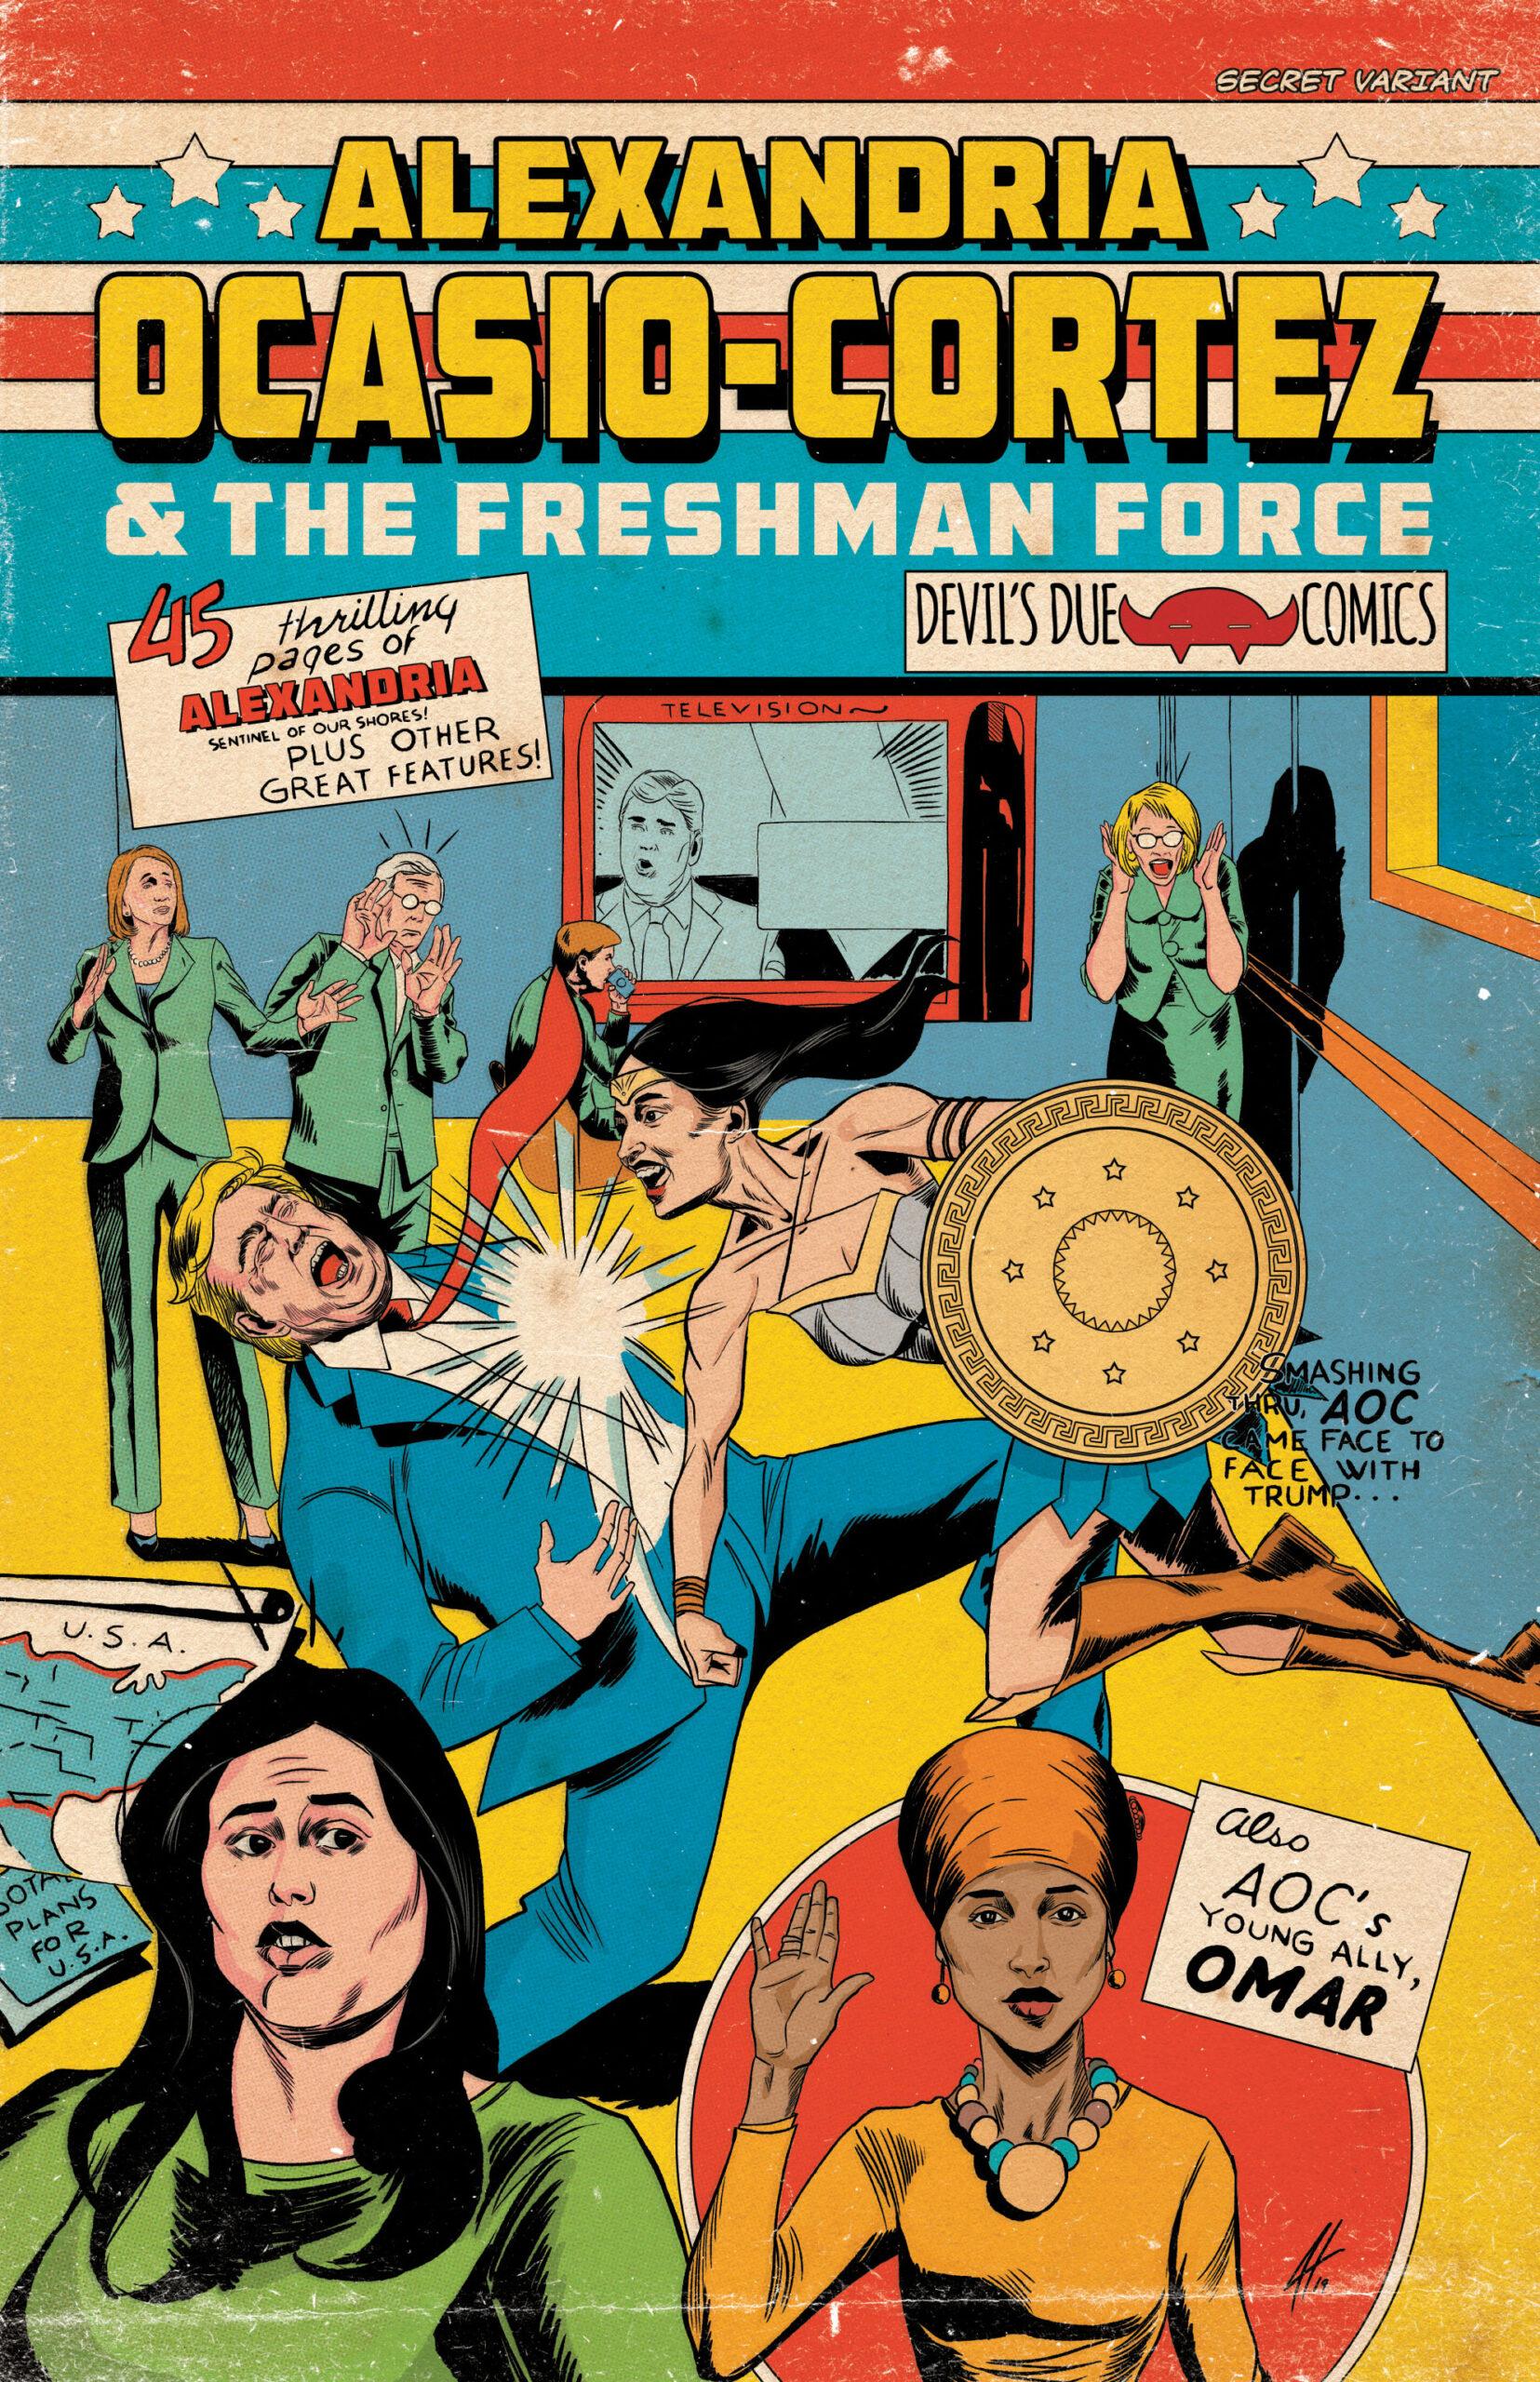 Josh Blaylock Talks About Alexandria Ocasio Cortez First Comics News Person » josh blaylock is credited in 138 issues. josh blaylock talks about alexandria